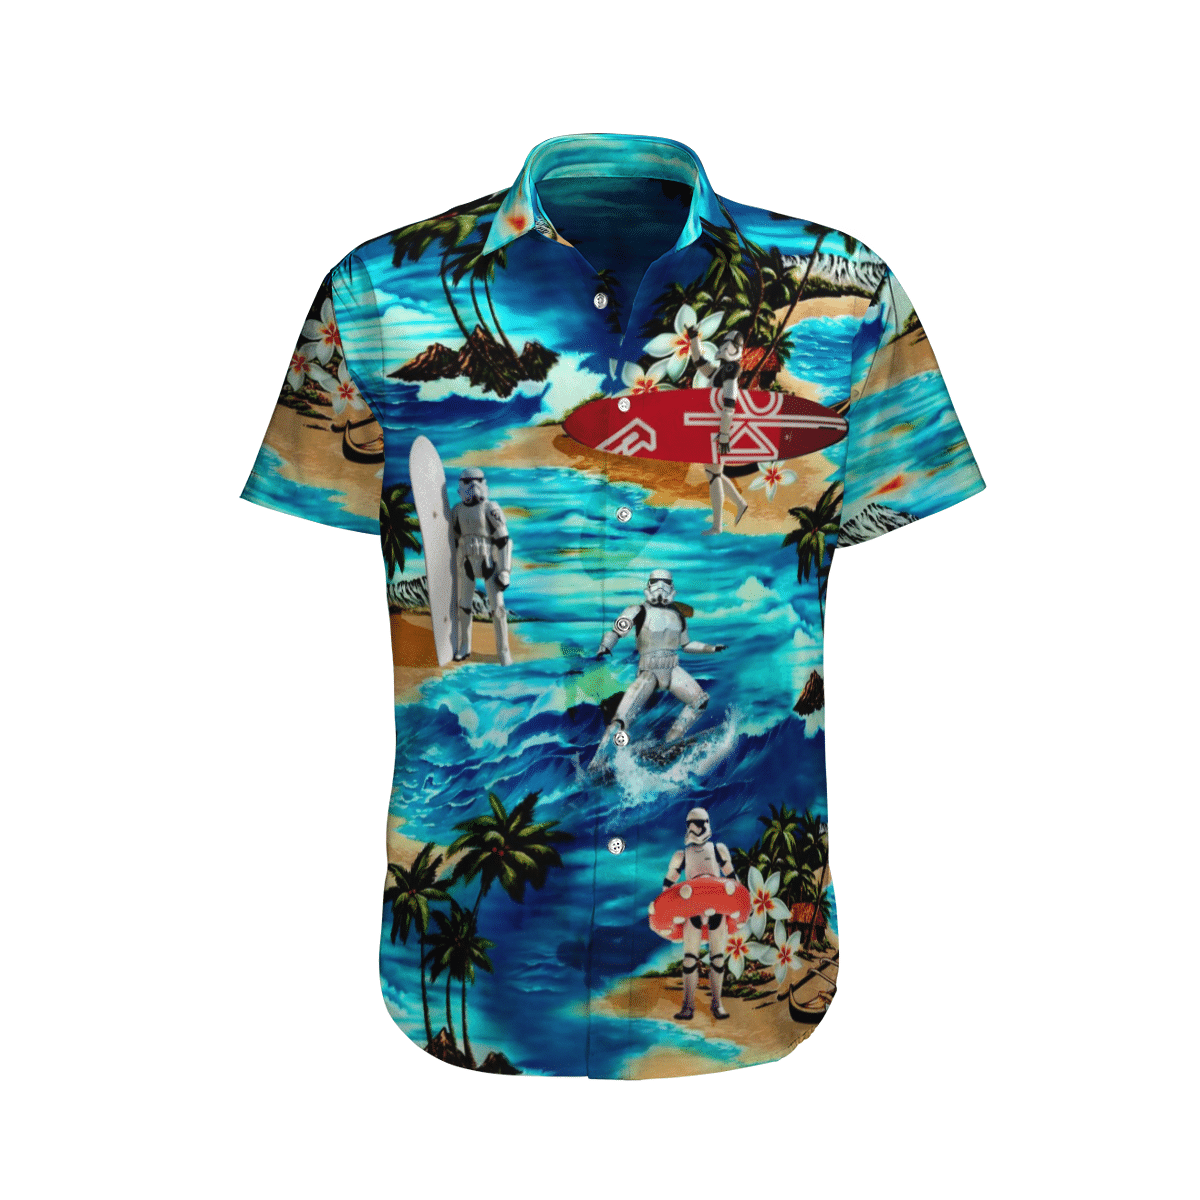 Star wars Stormtrooper Surfing Hawaiian Shirt